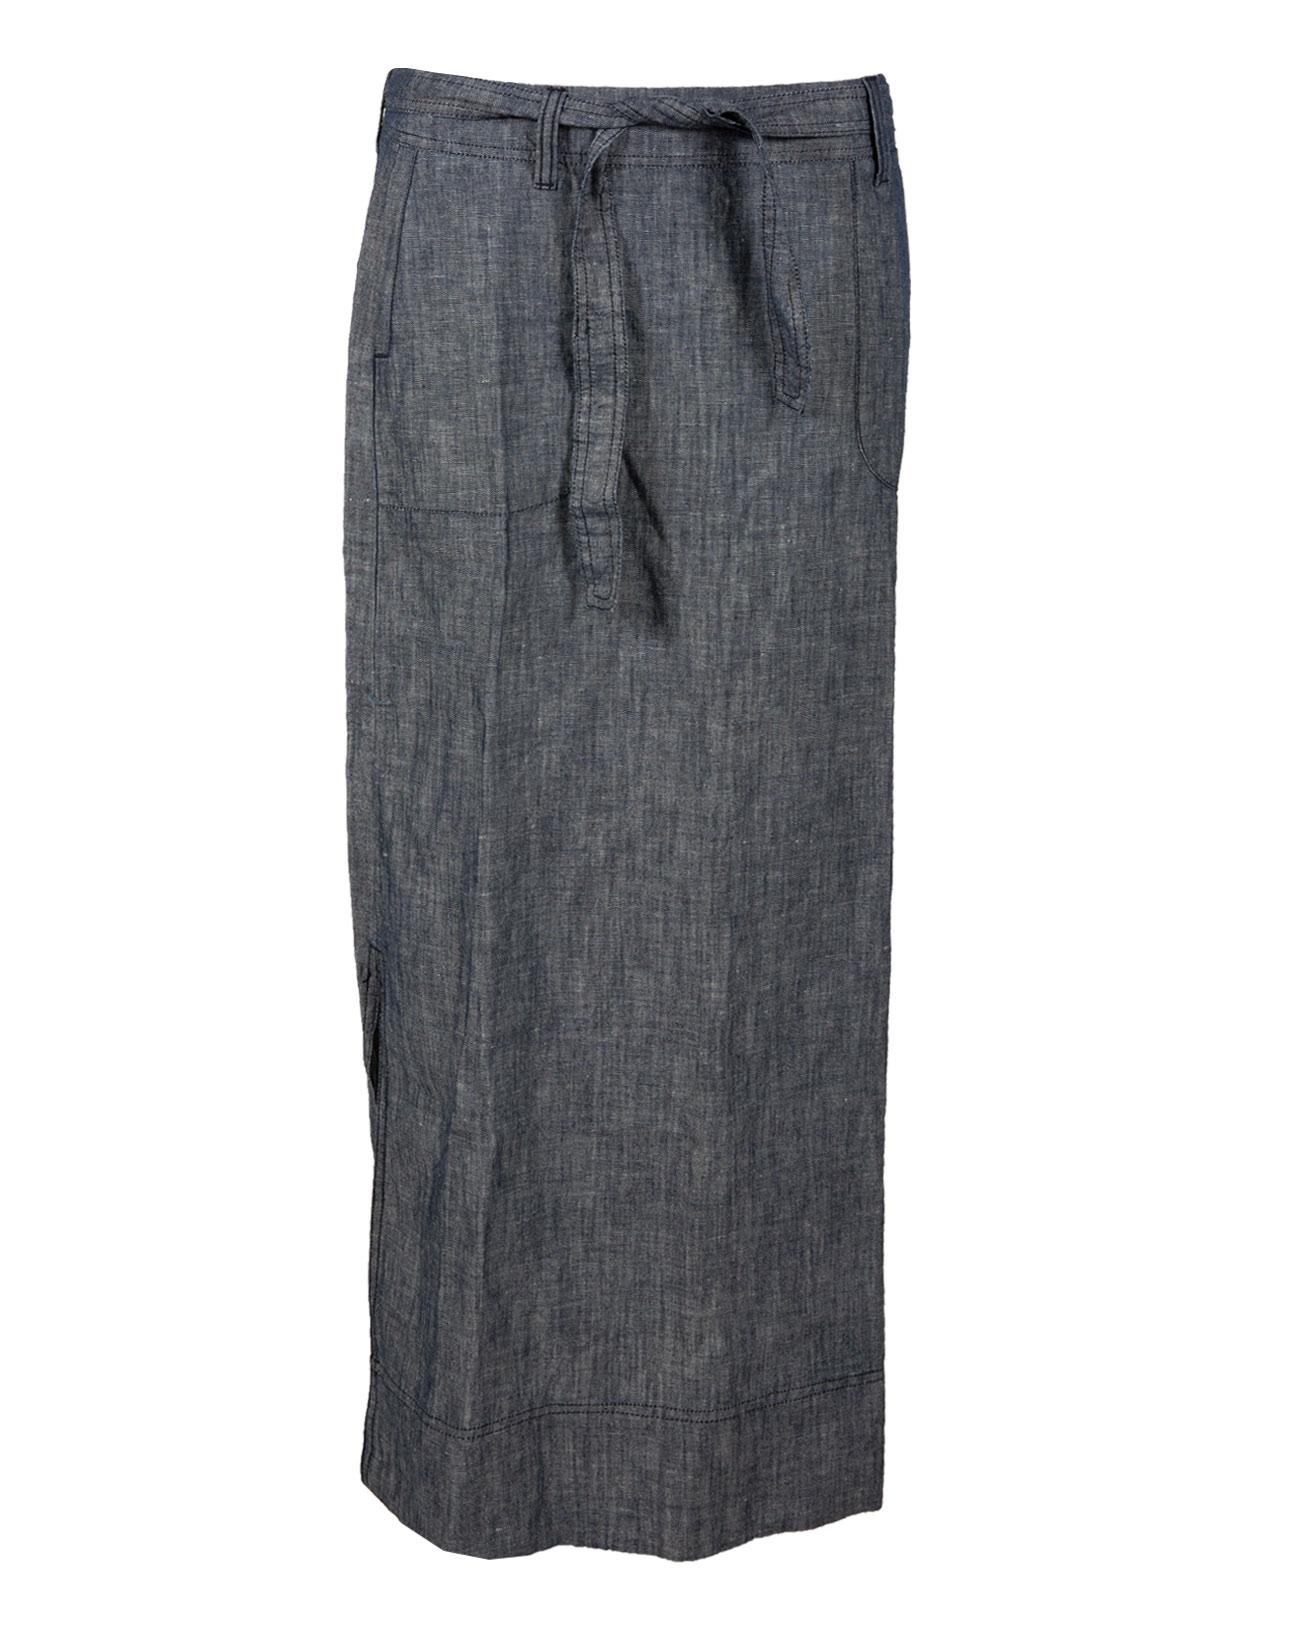 Maxi Chambray Skirt - Size Xsmall - Denim - 449